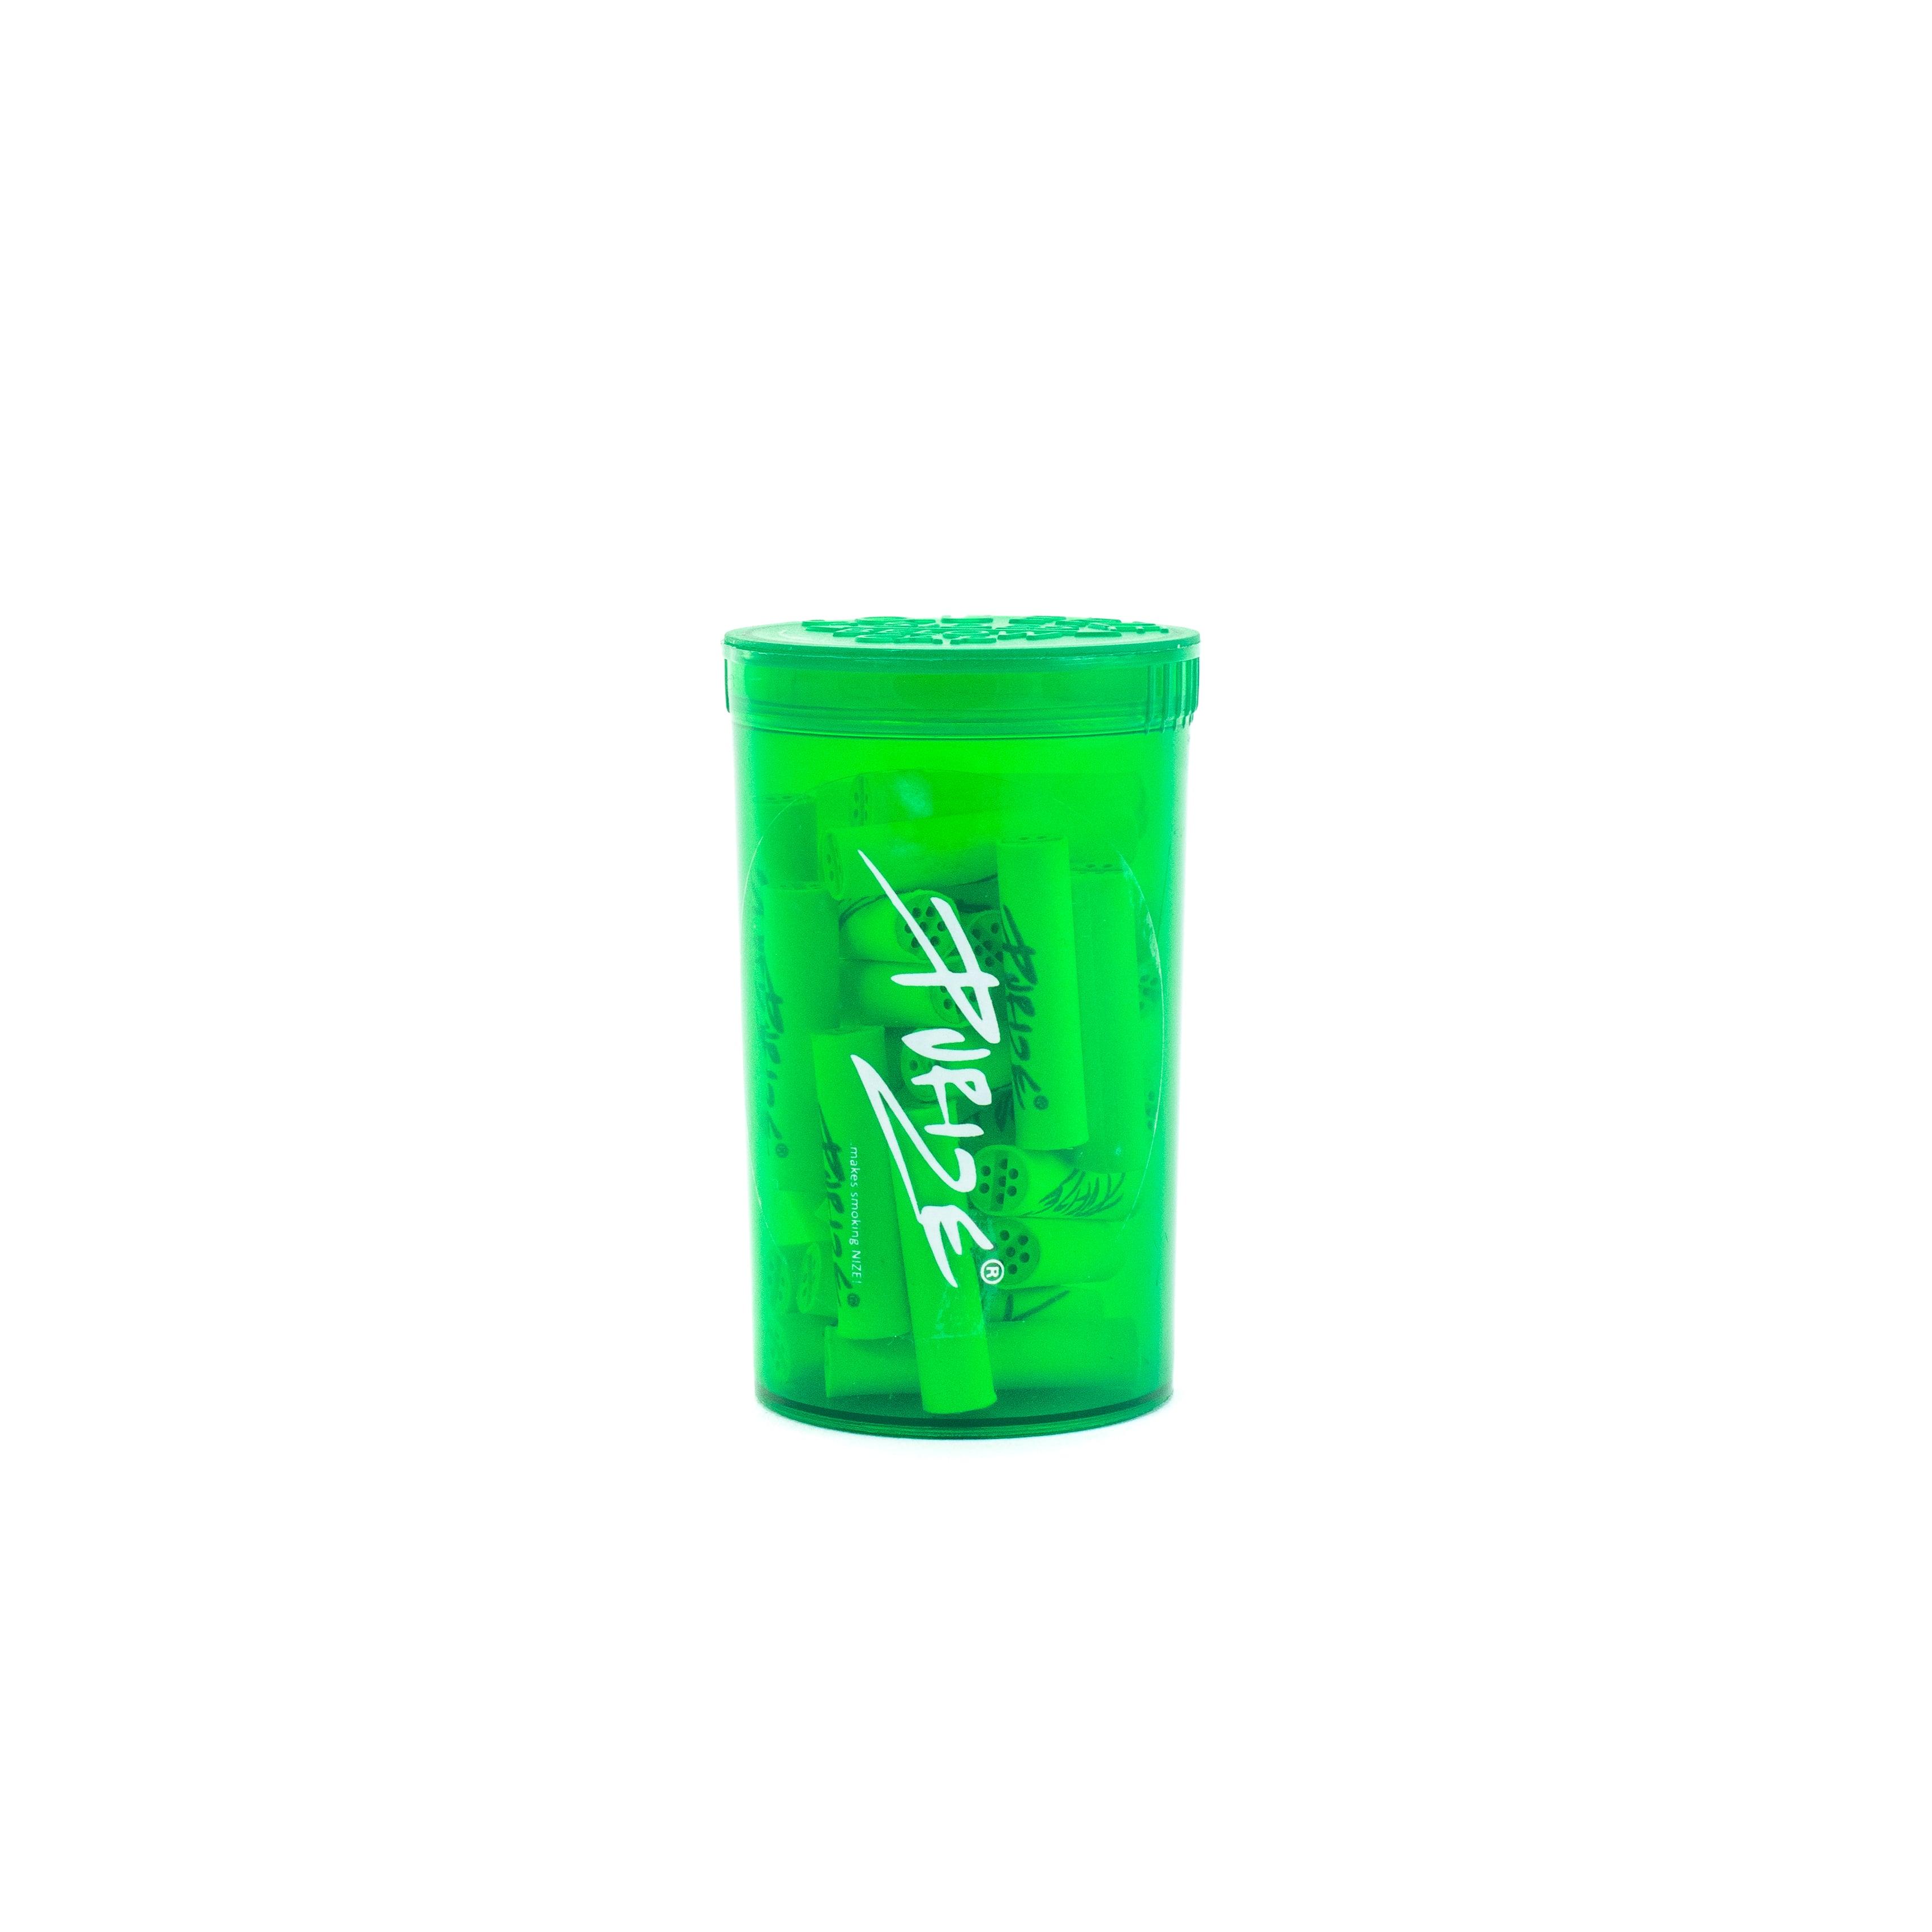 PURIZE® Pop Up – 33 XTRA Slim Size